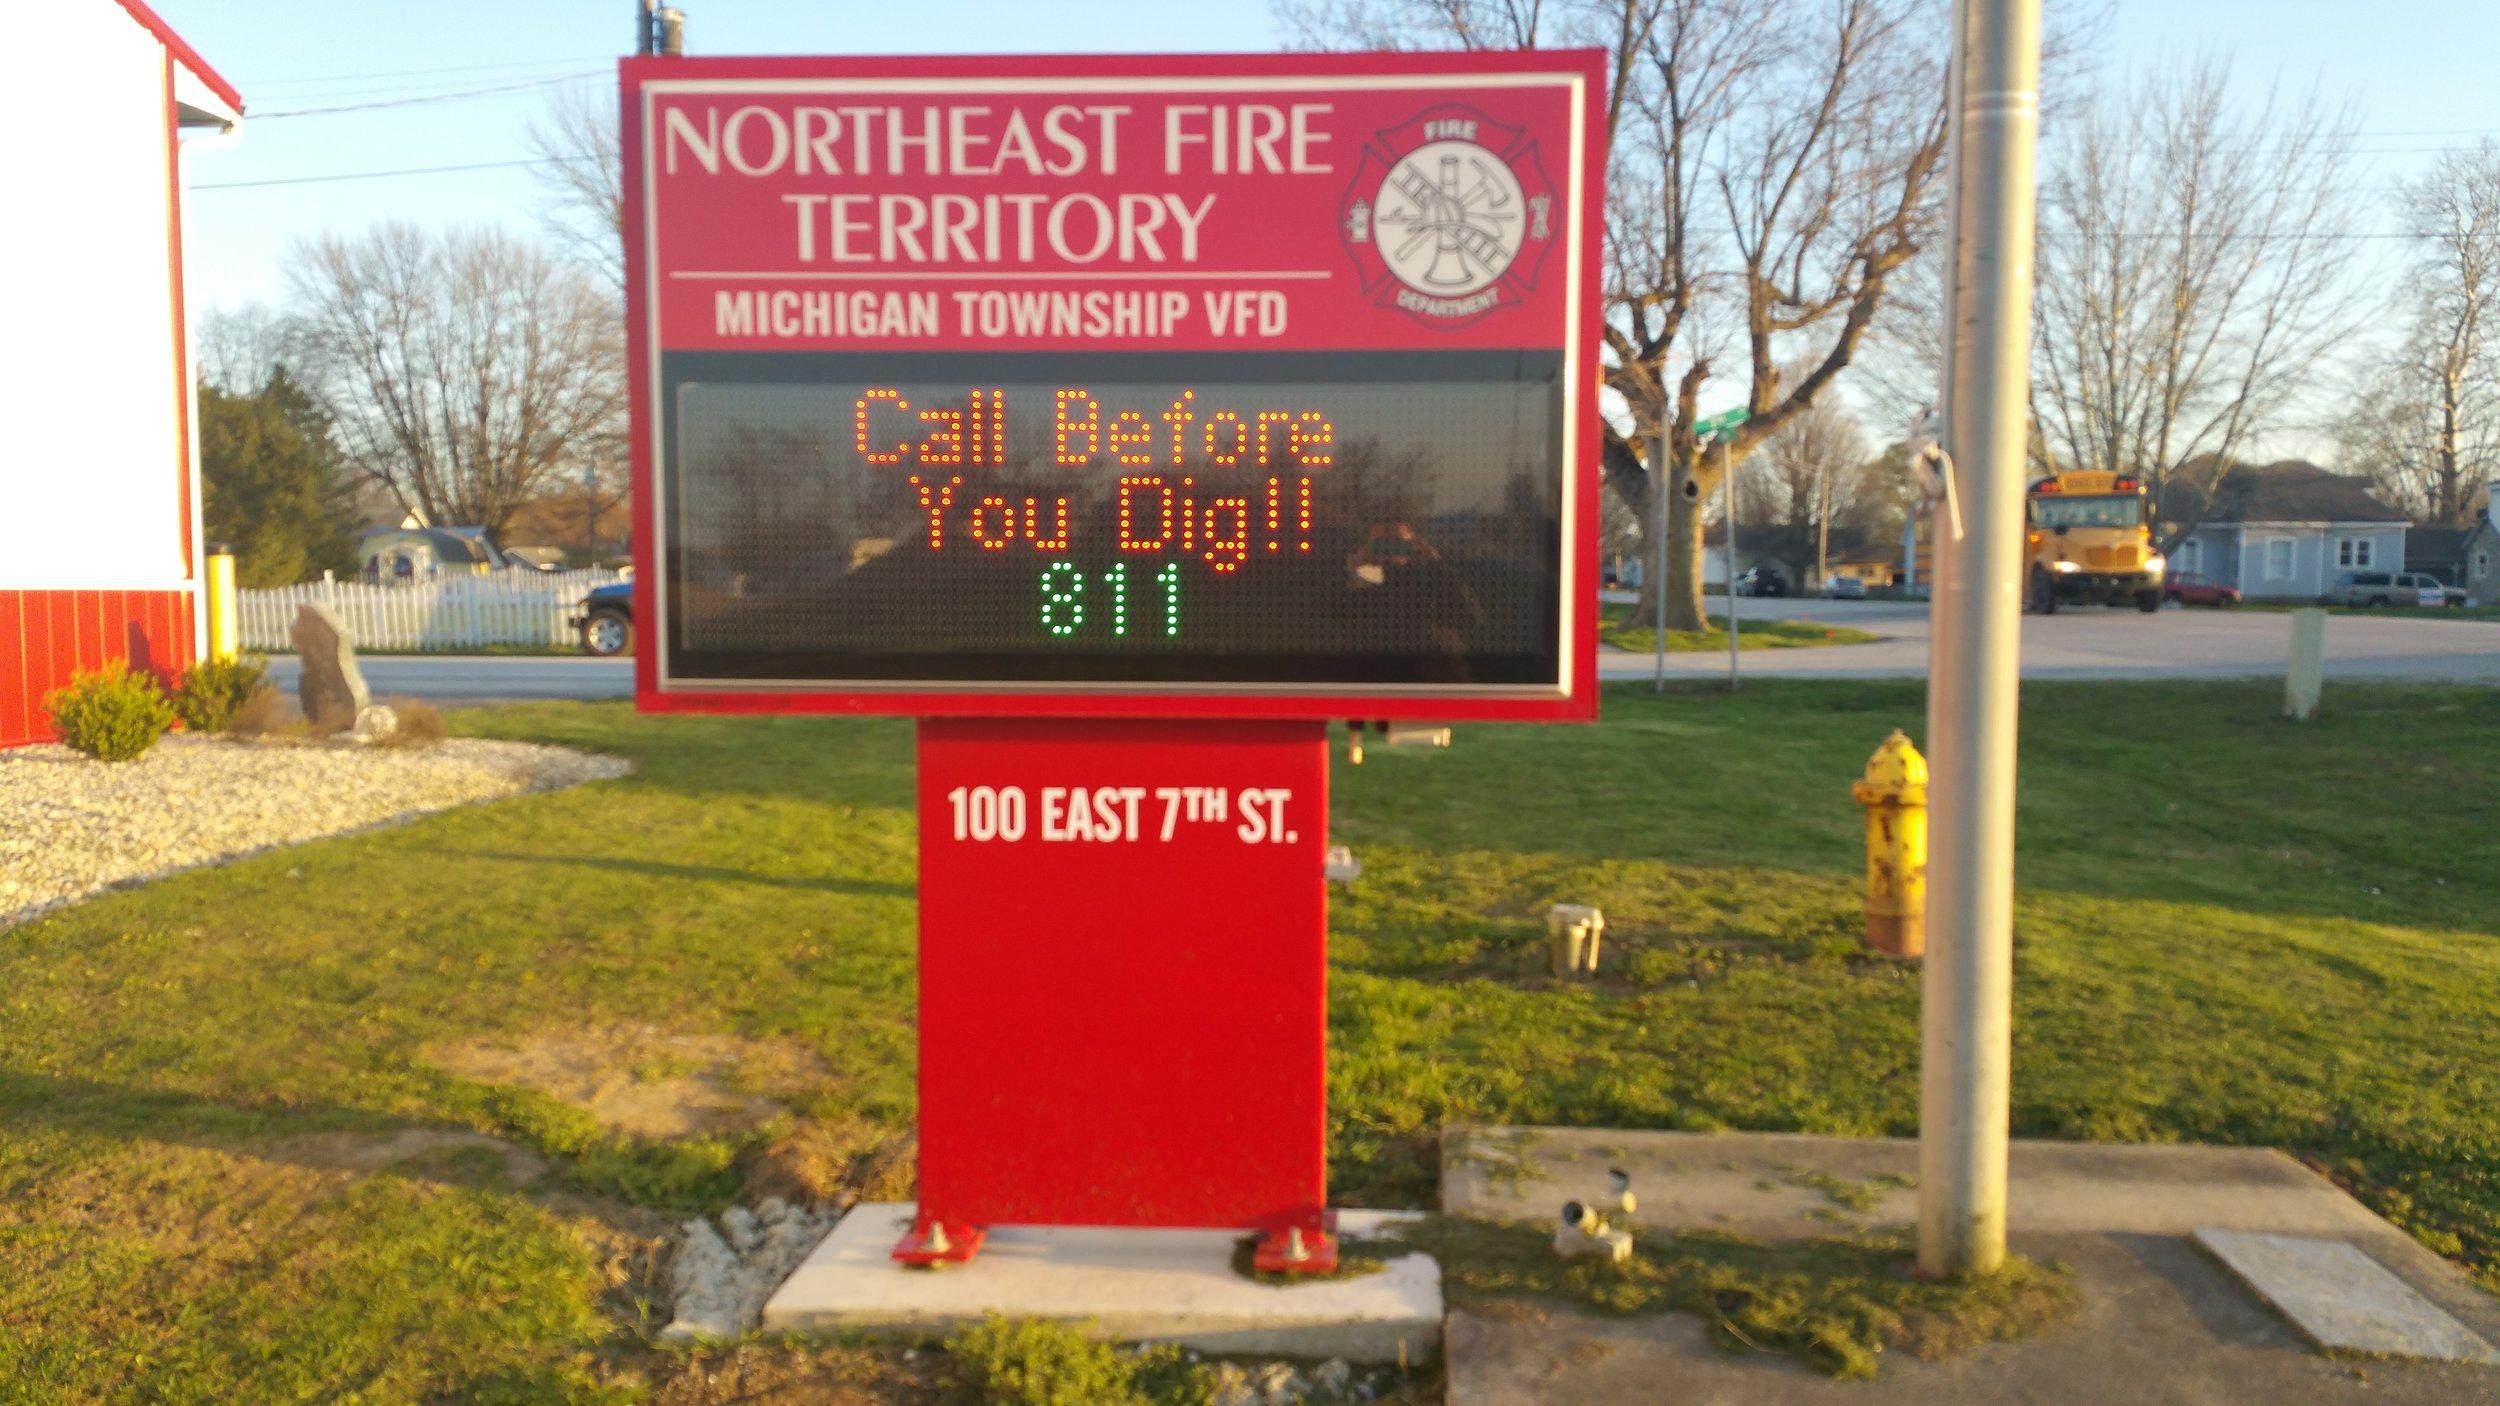 Michigan Township Volunteer Fire Department